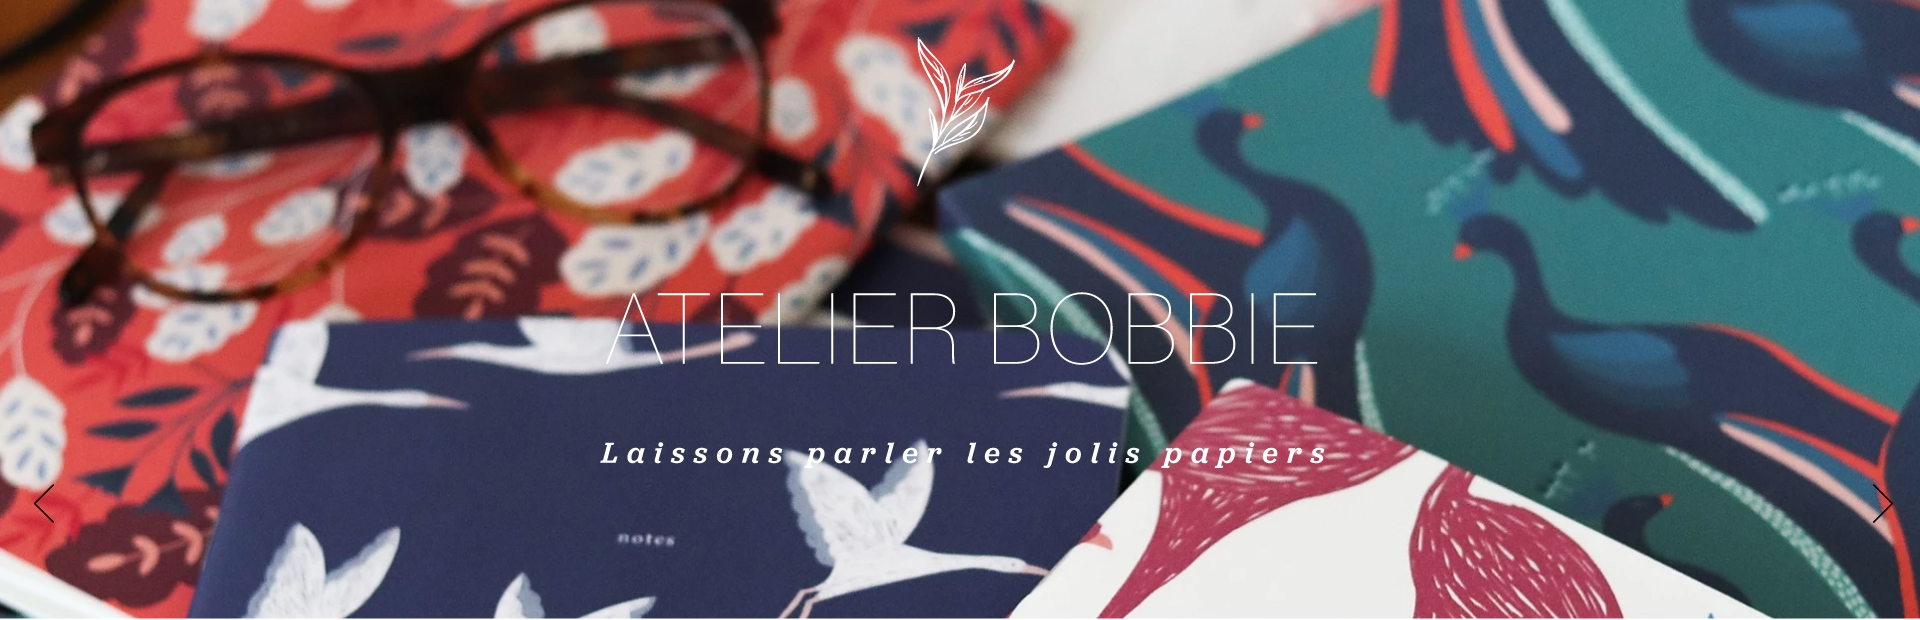 Atelier Bobbie